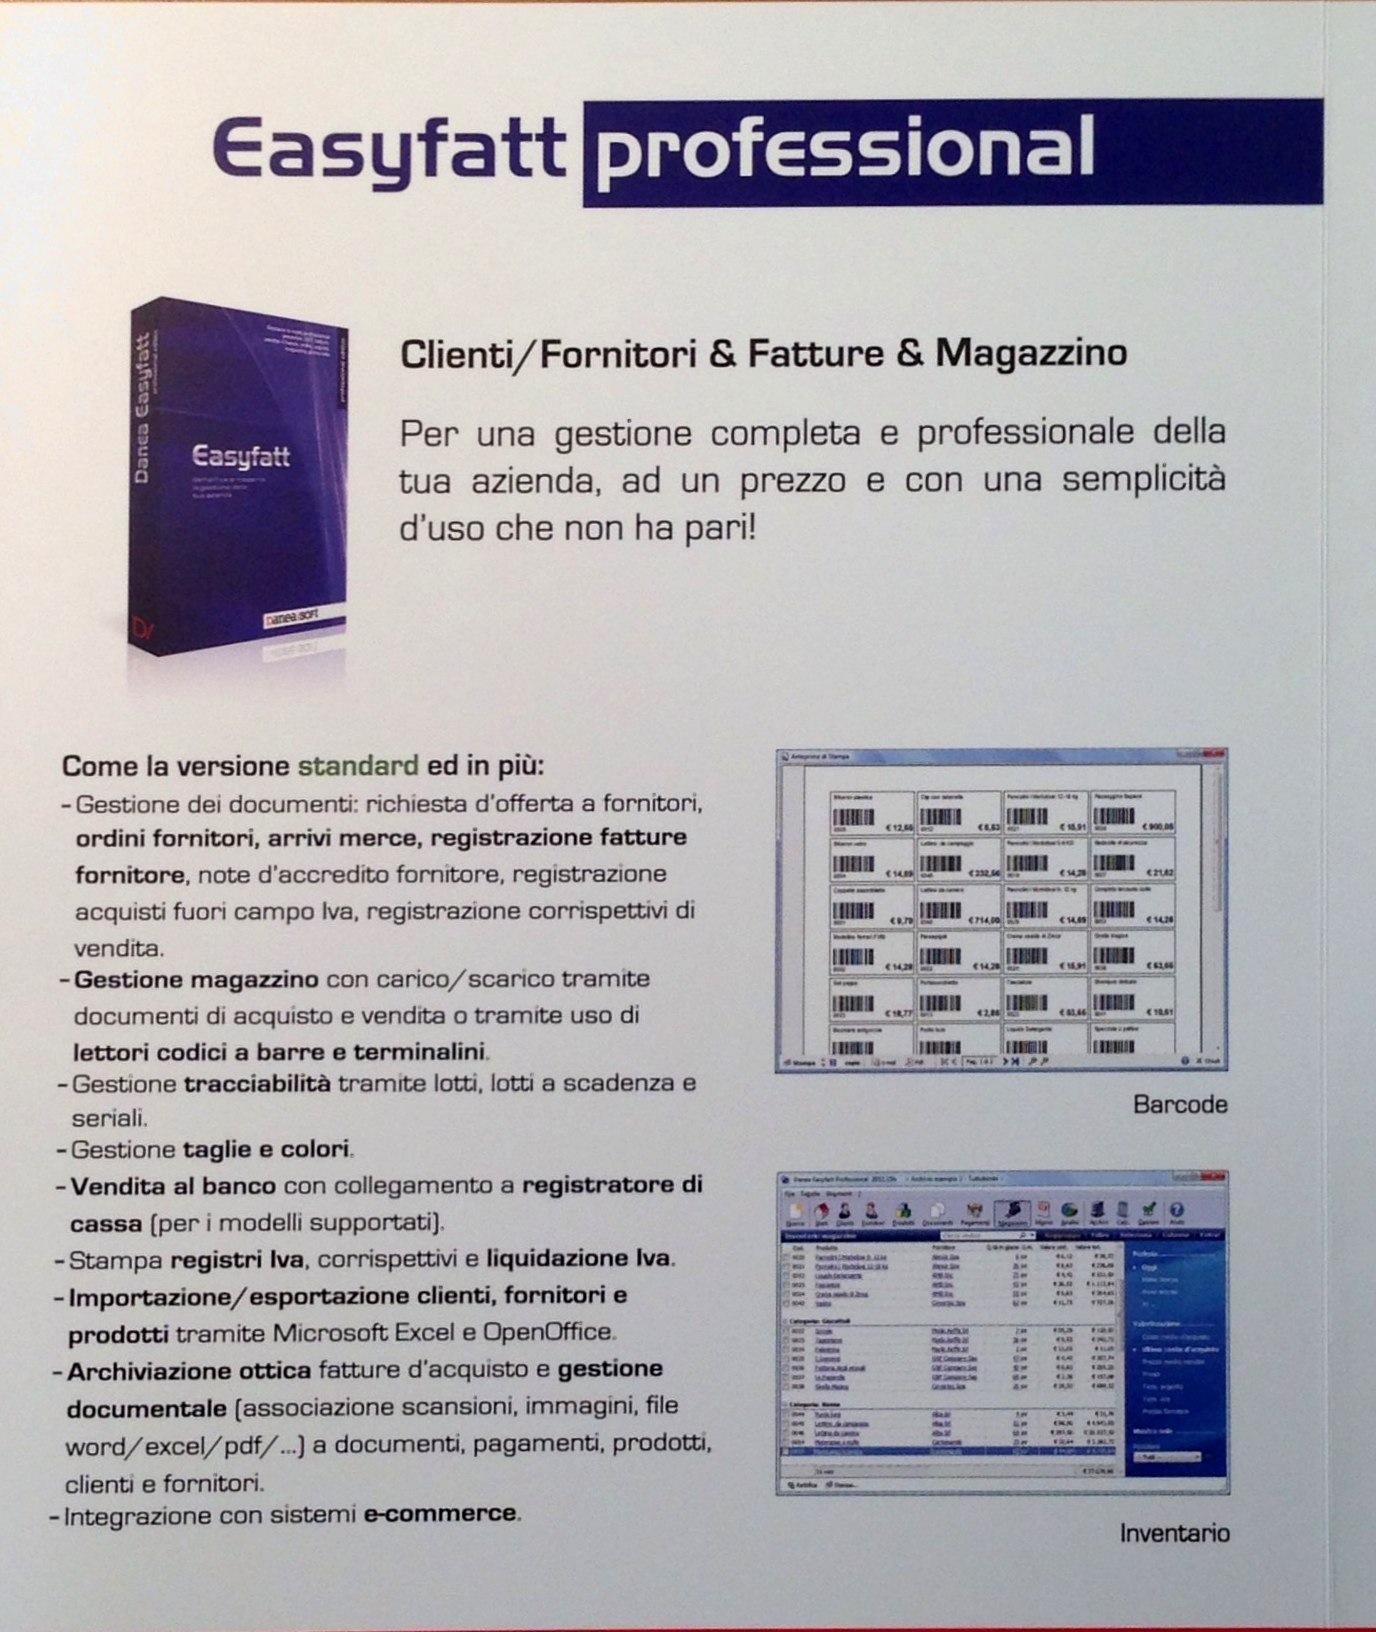 2 Easyfatt Professional